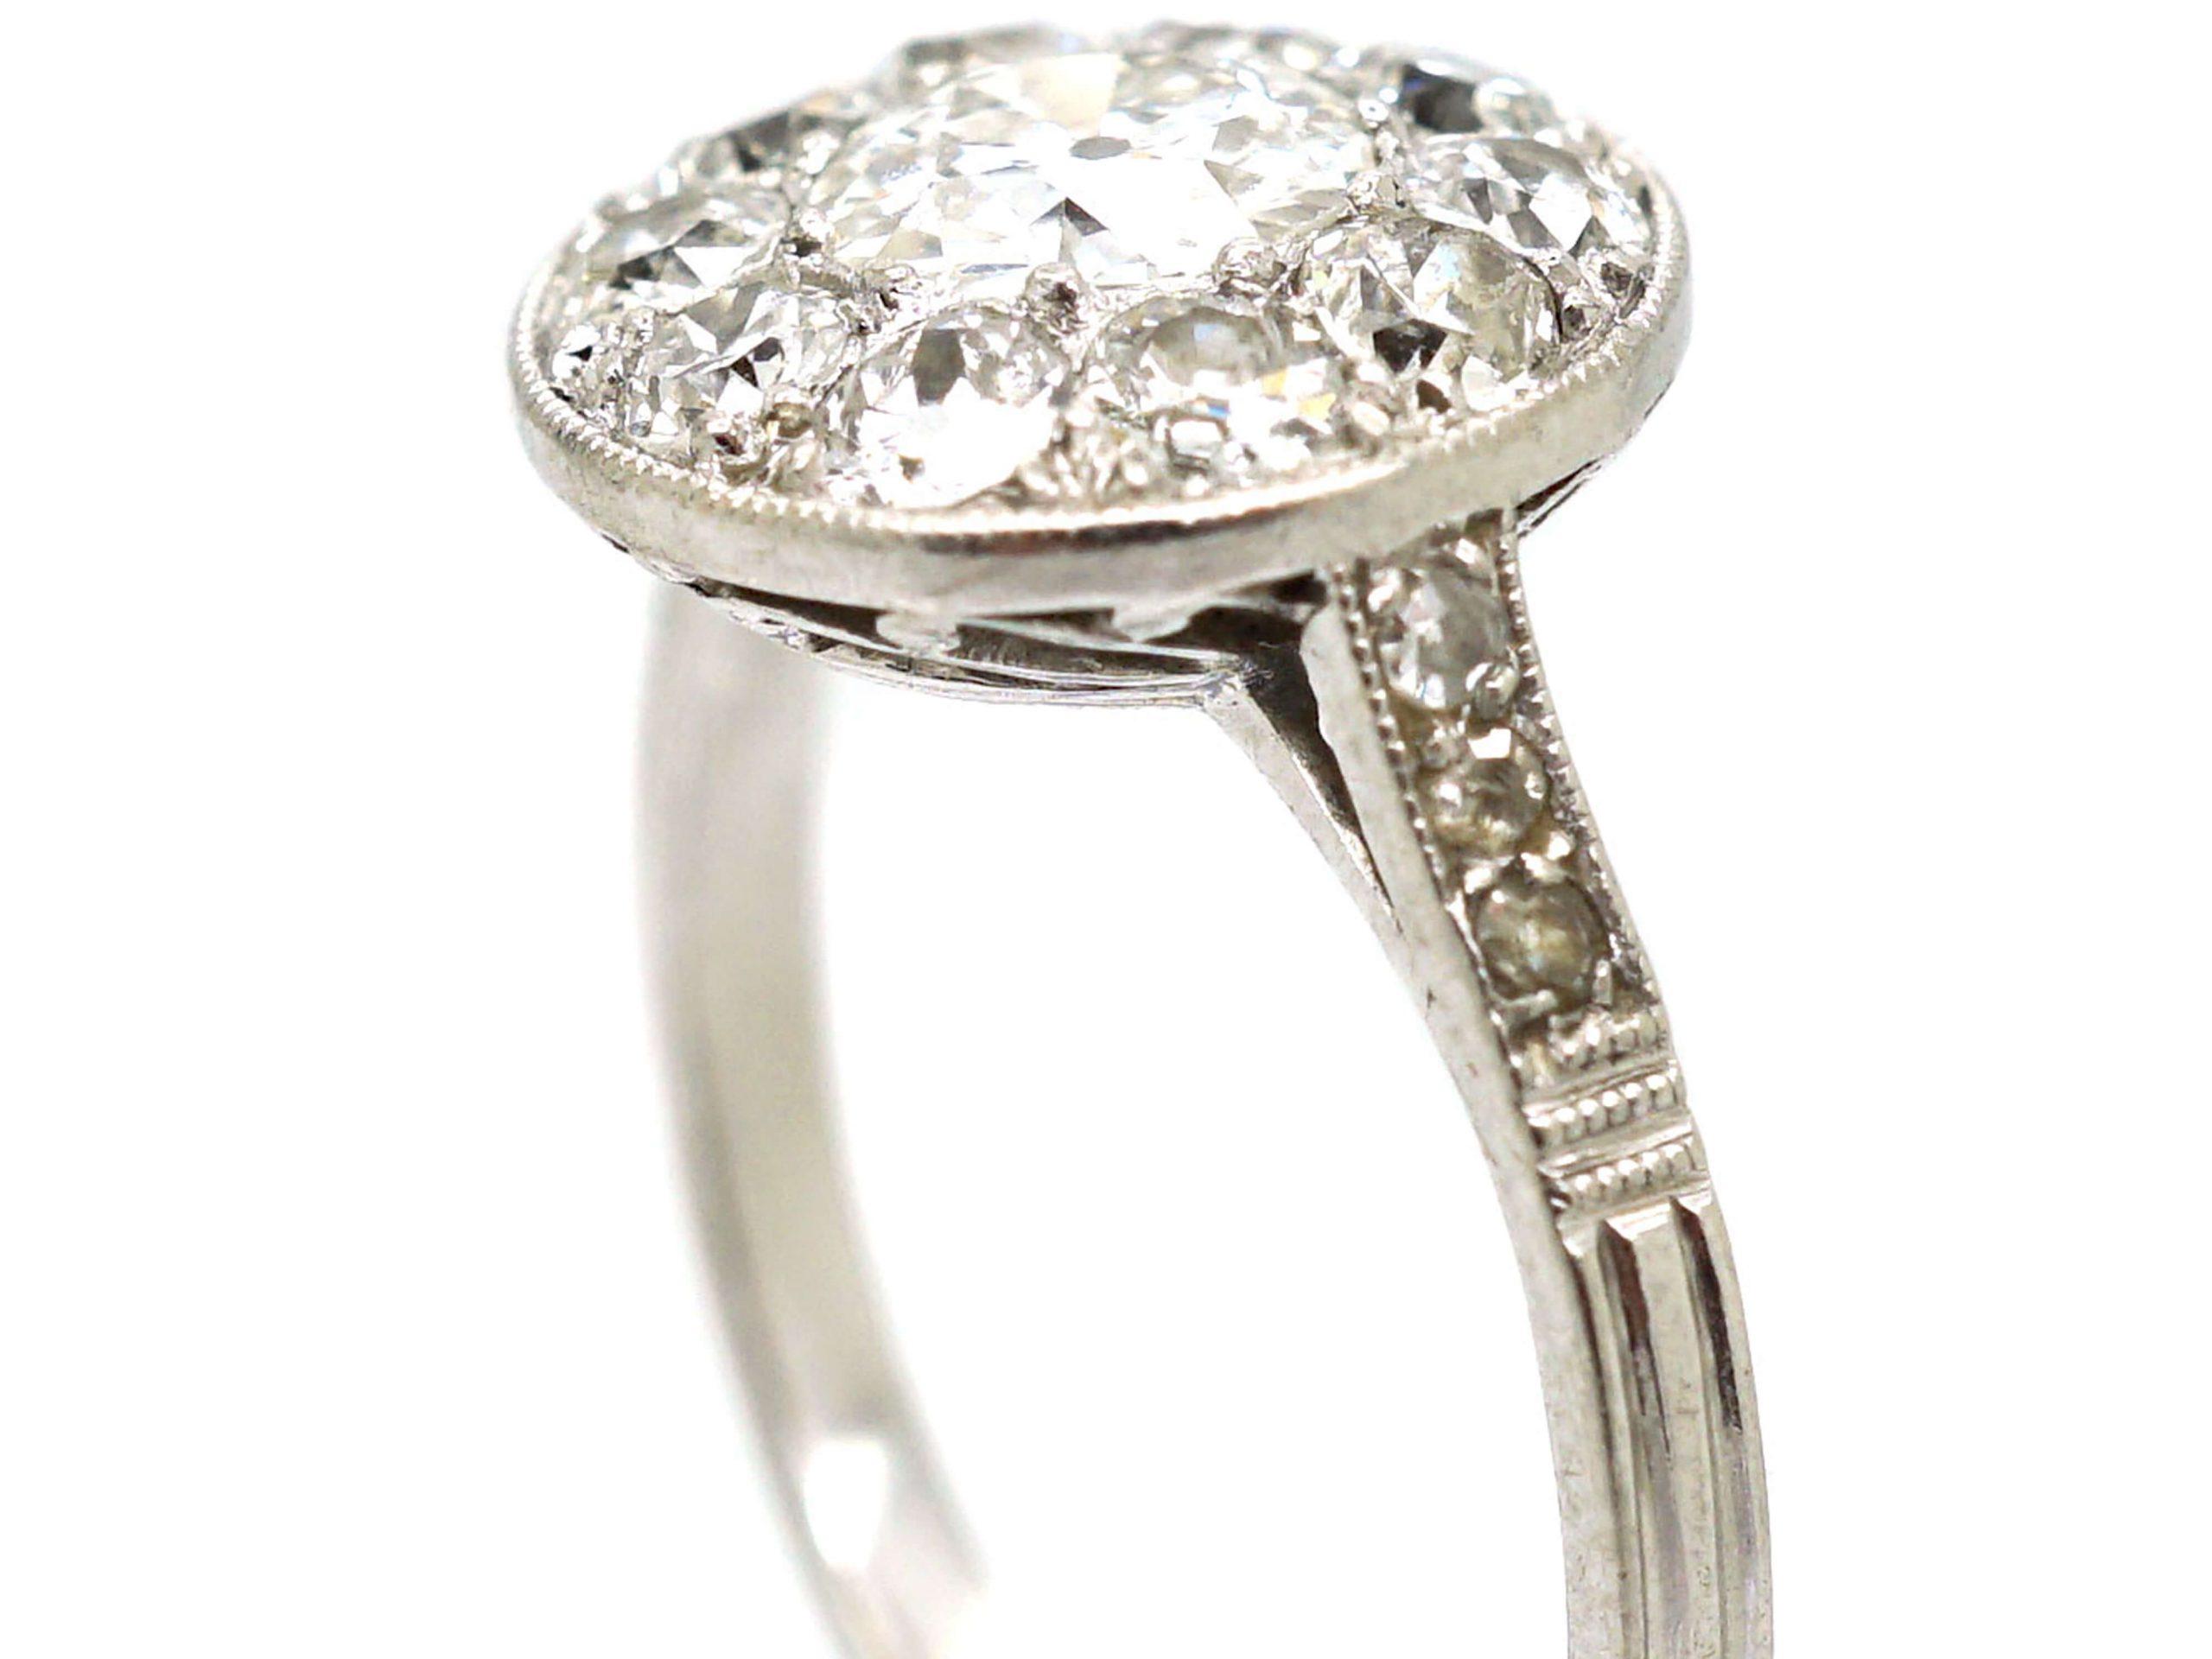 Art Deco Platinum, Diamond Cluster Ring with Diamond Shoulders